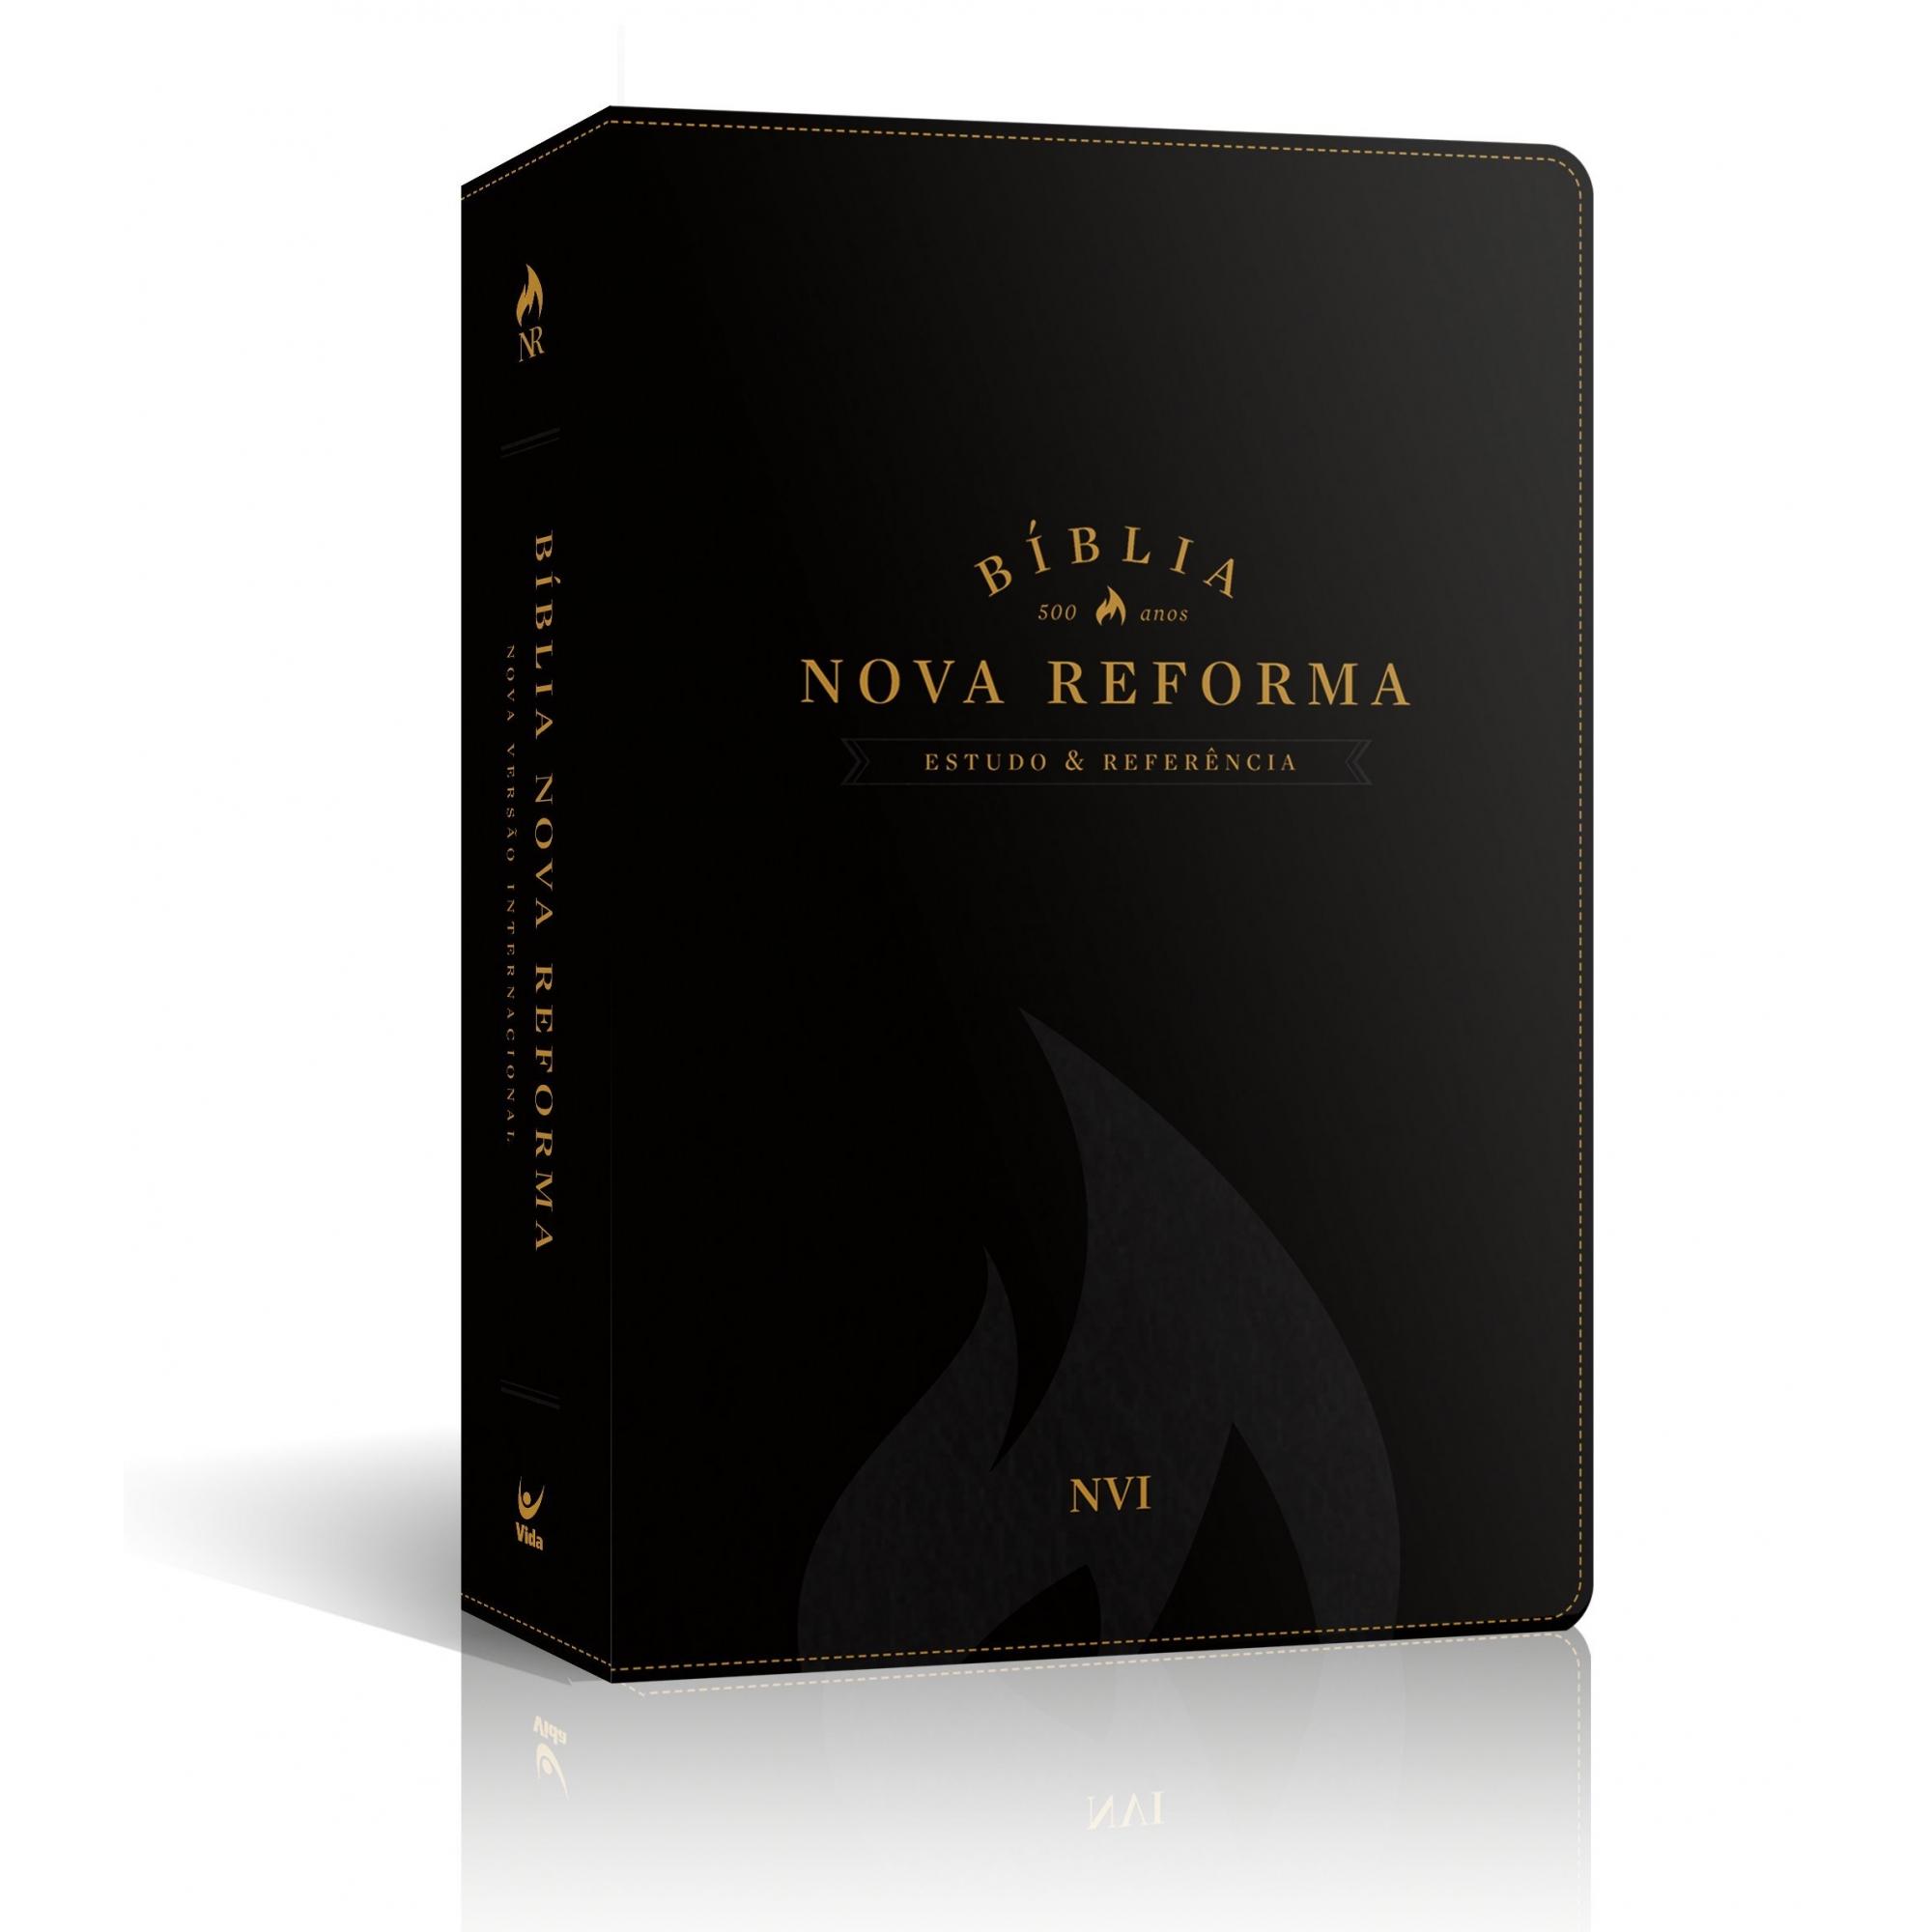 Biblia Nova Reforma. NVI - Capa de Luxo Preta  - Universo Bíblico Rs